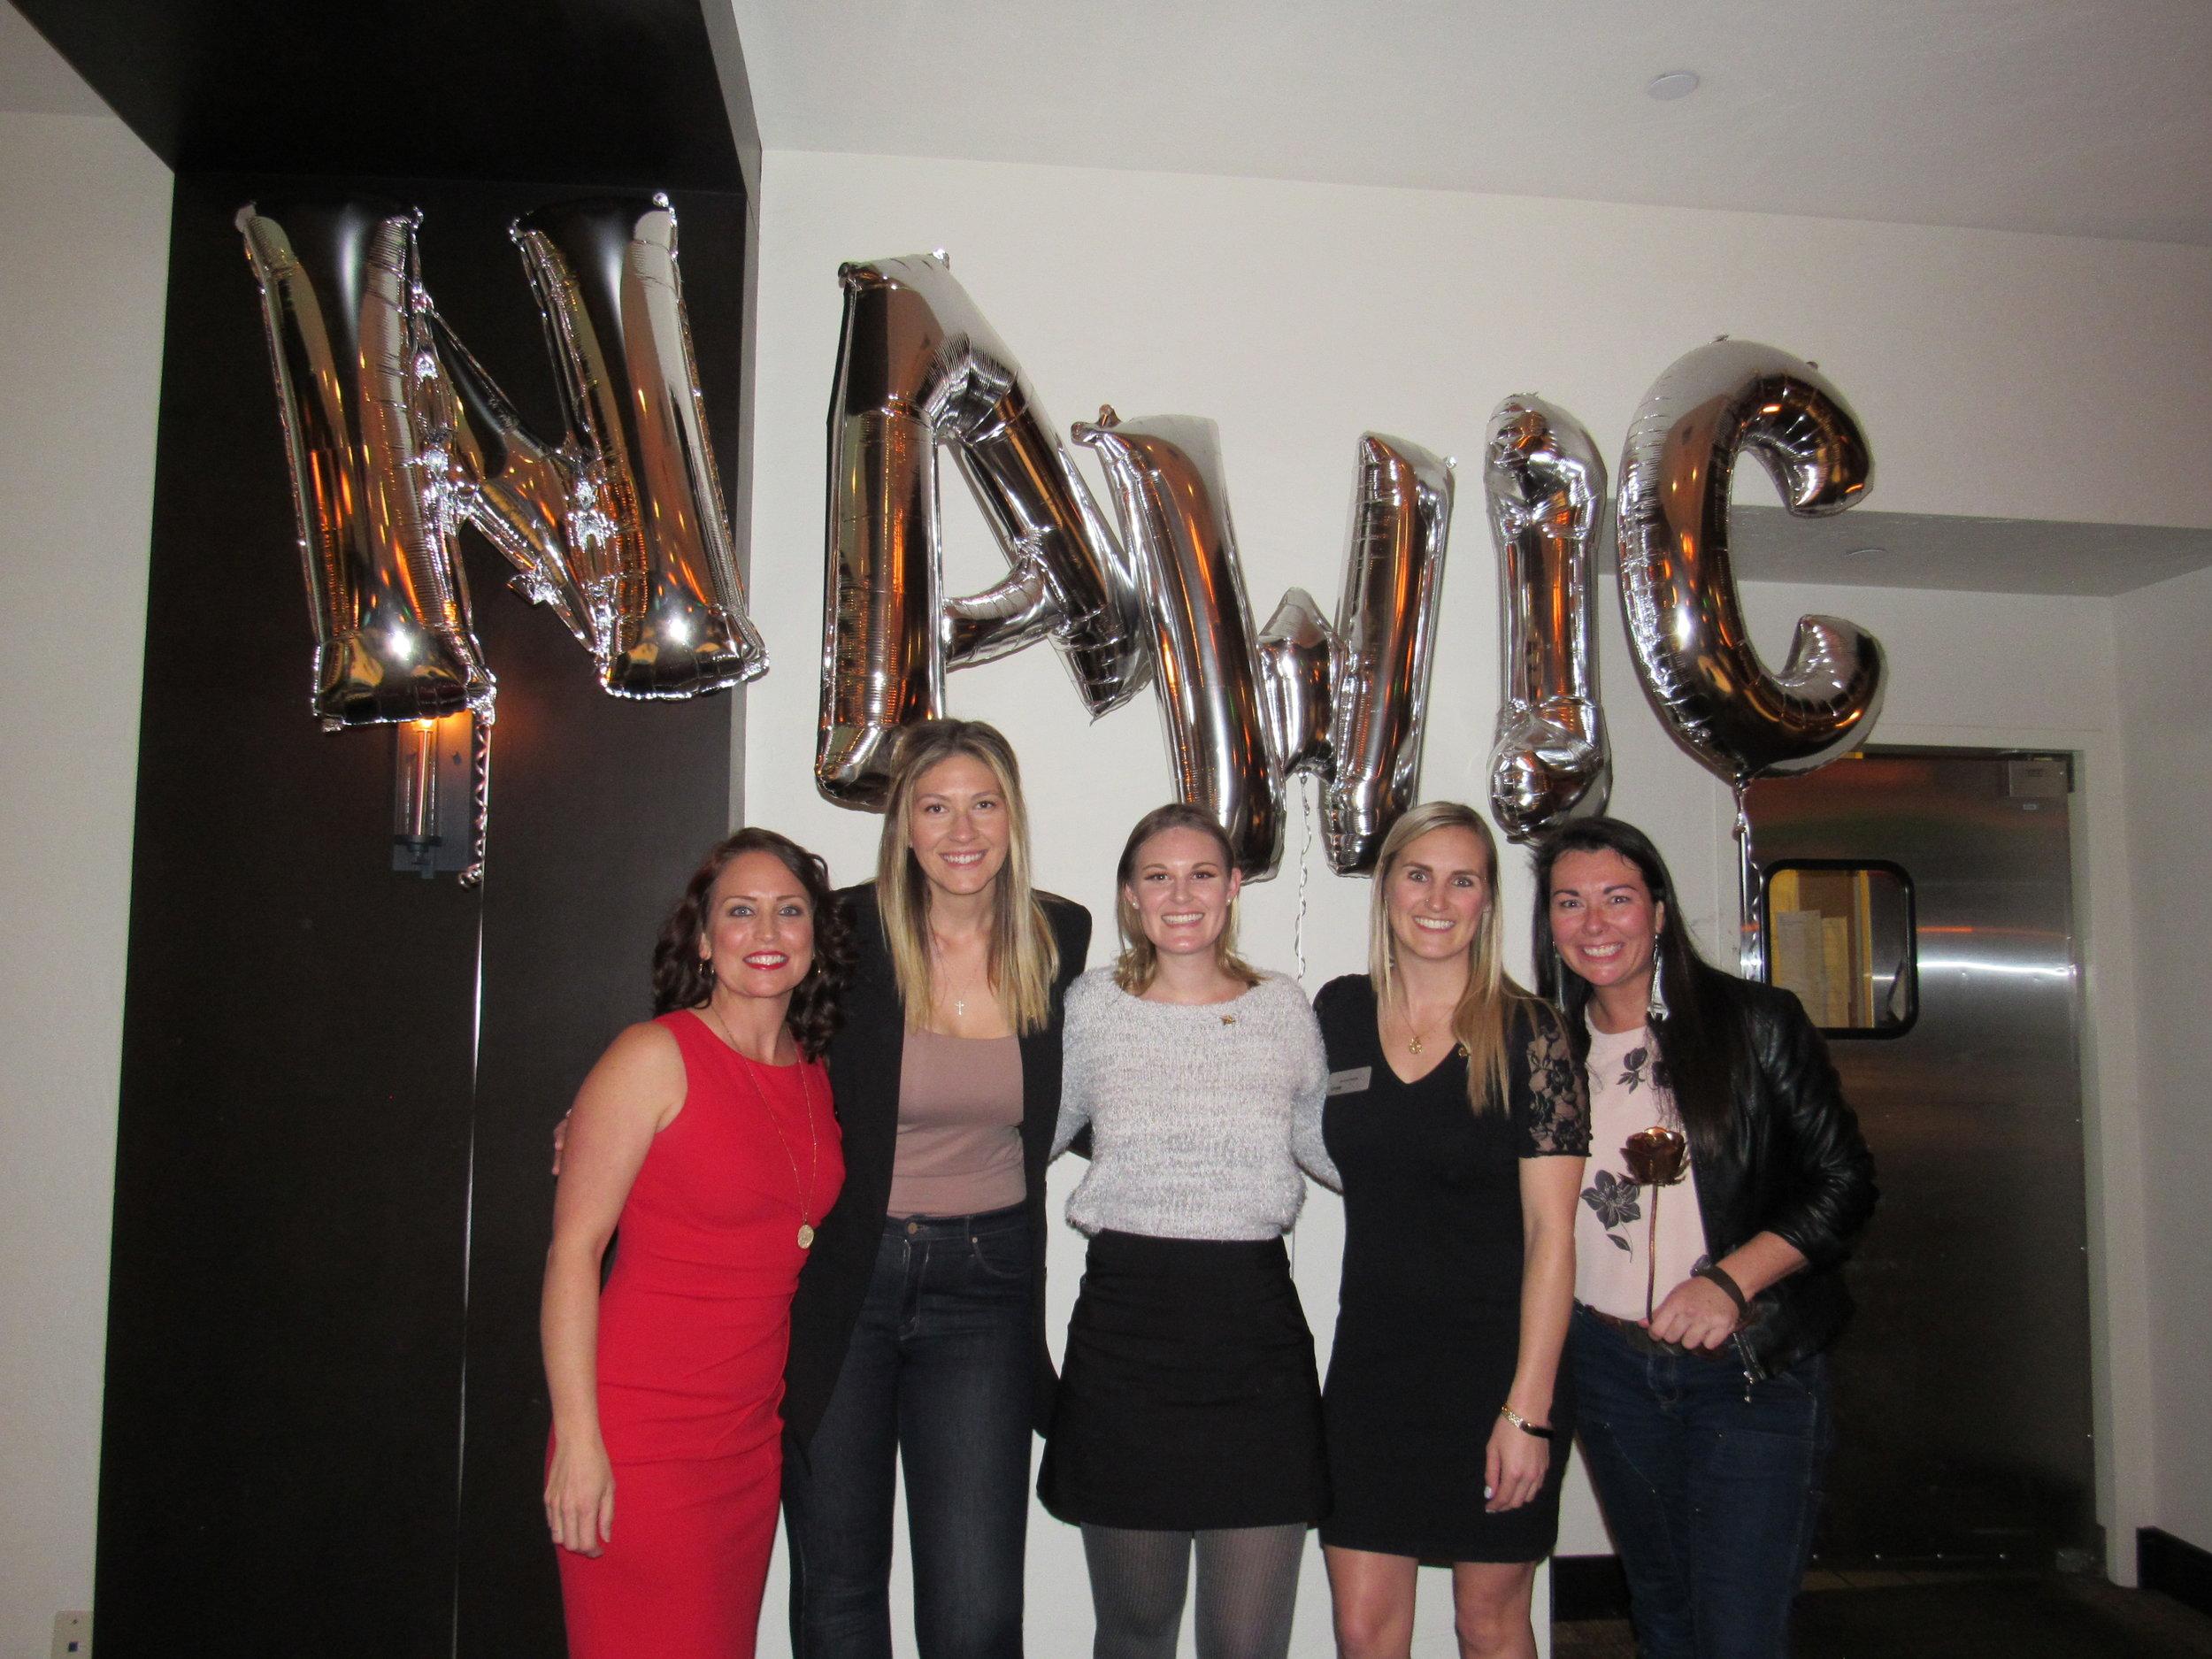 Alyssa Burley, Tosha Carapella, Shelby Ballow, Amber Webb, Kayleen McCabe